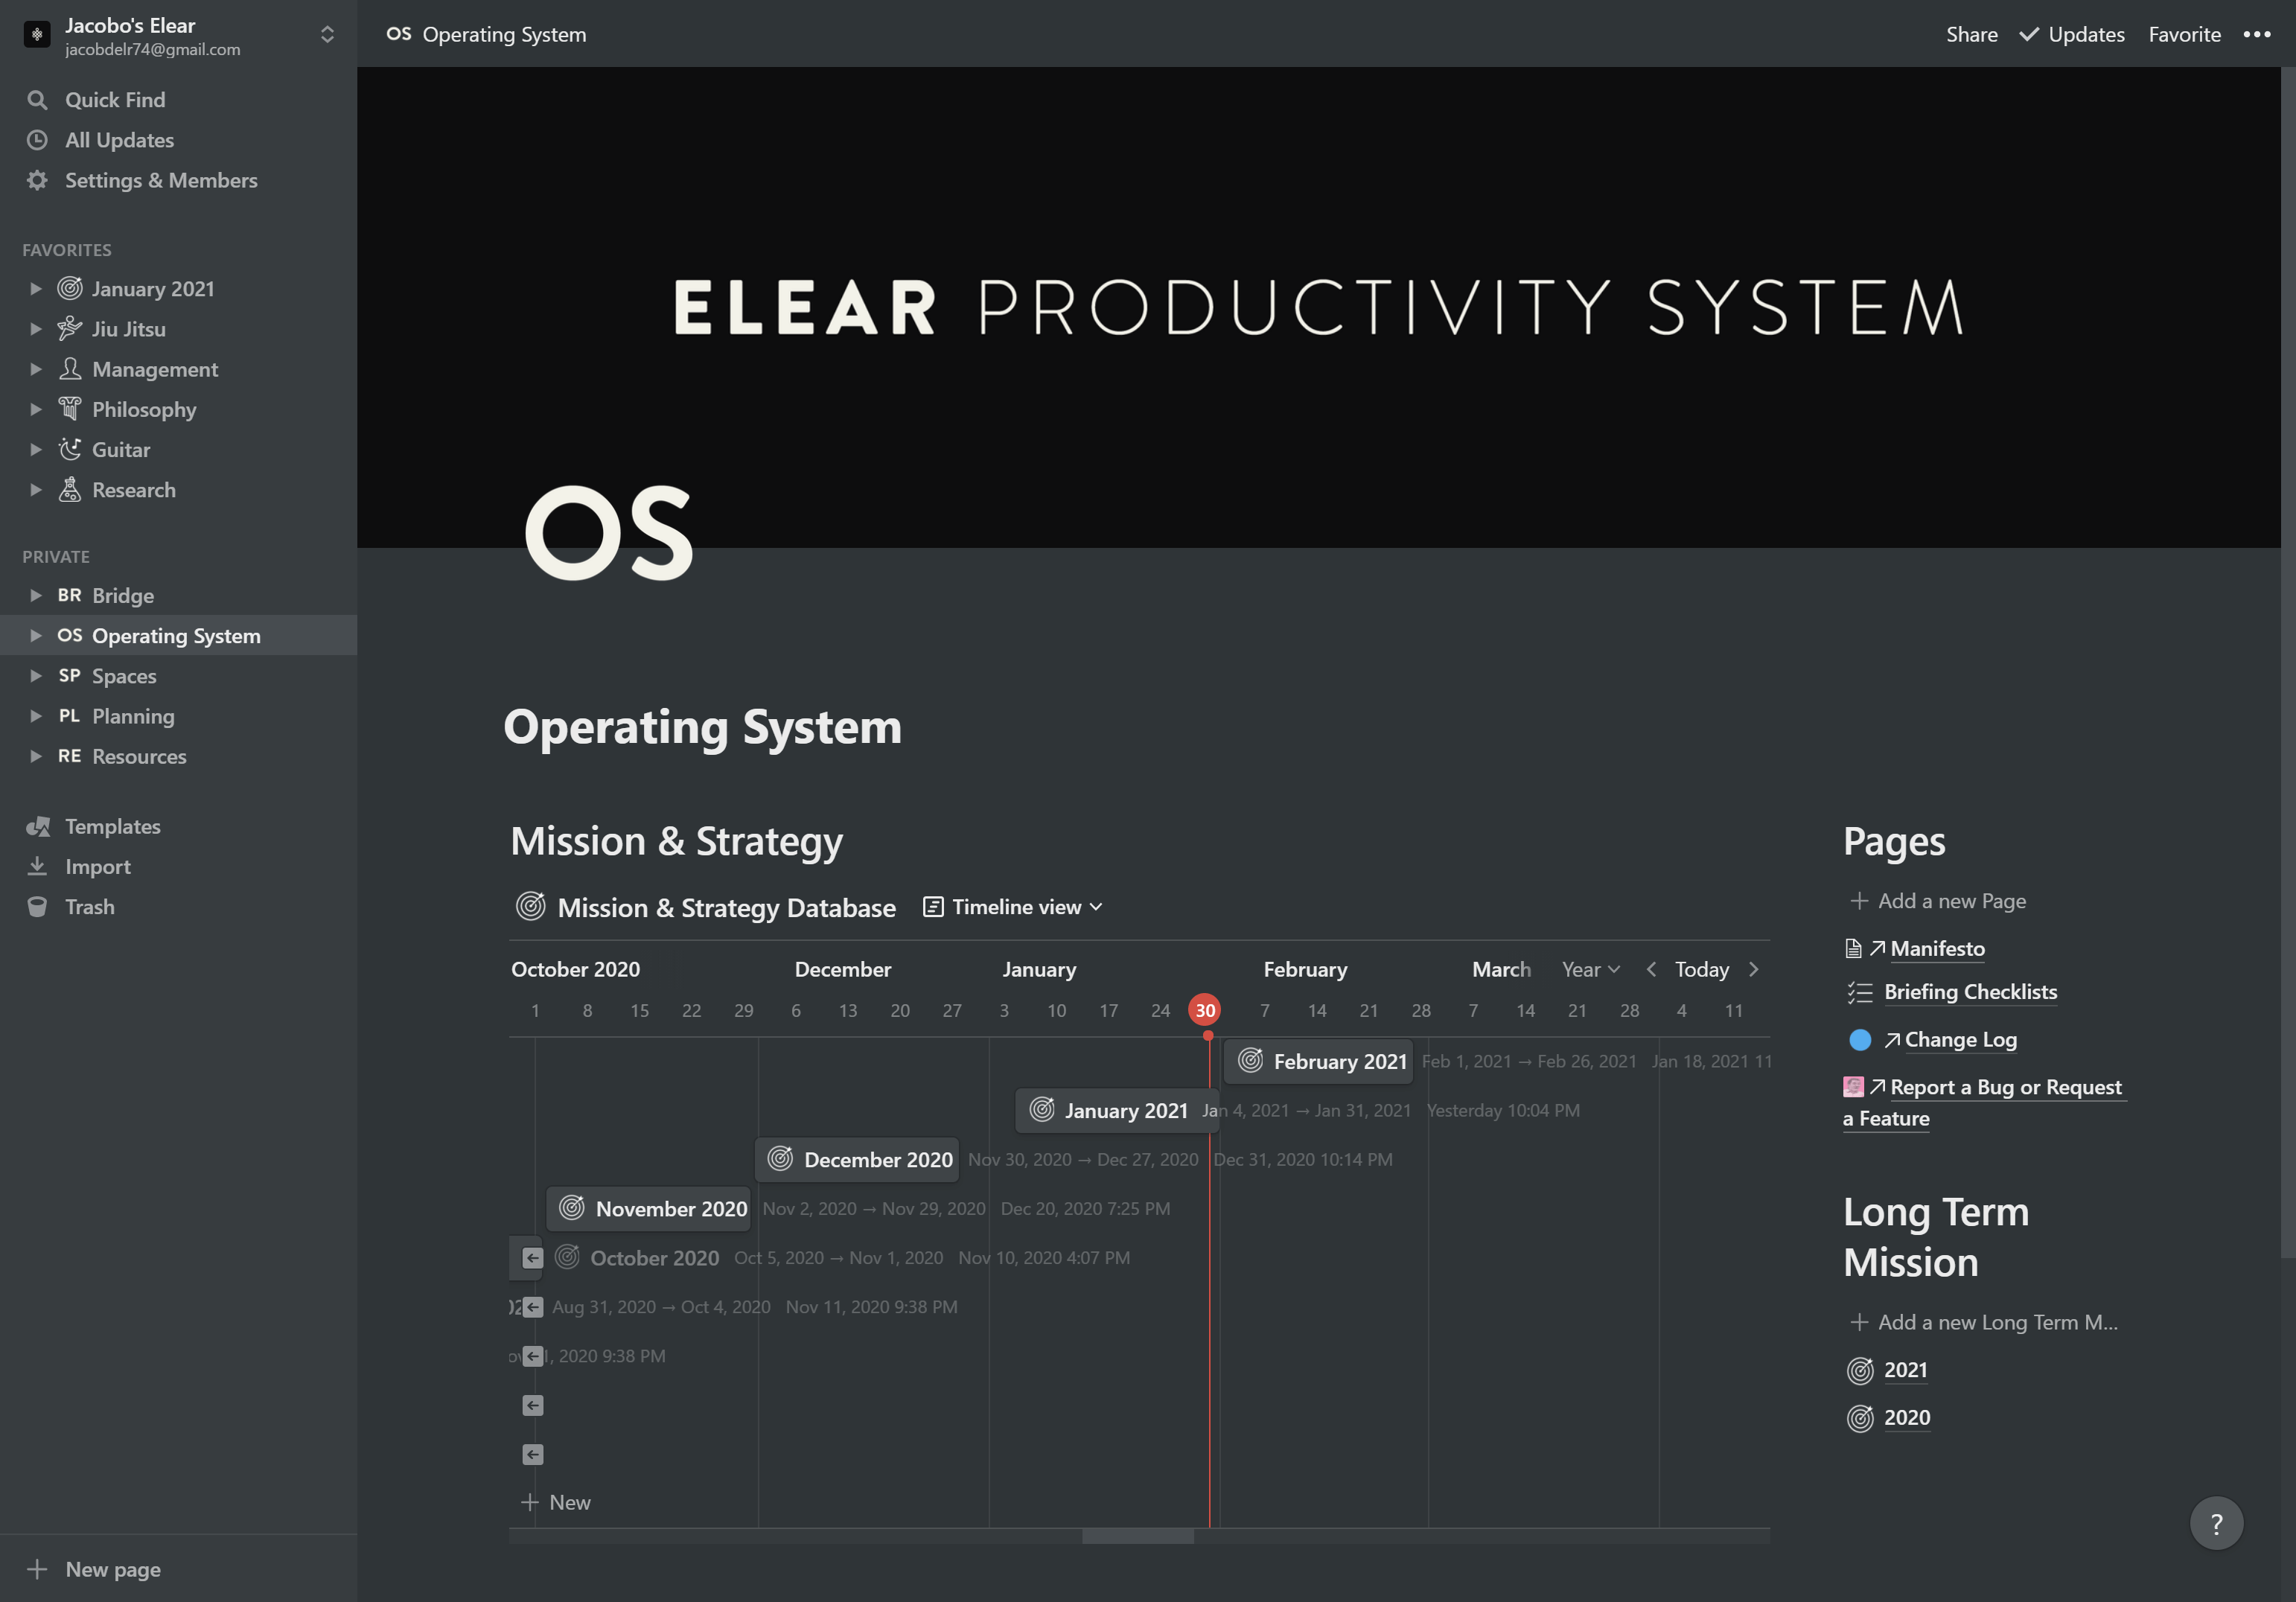 Elear Productivity System